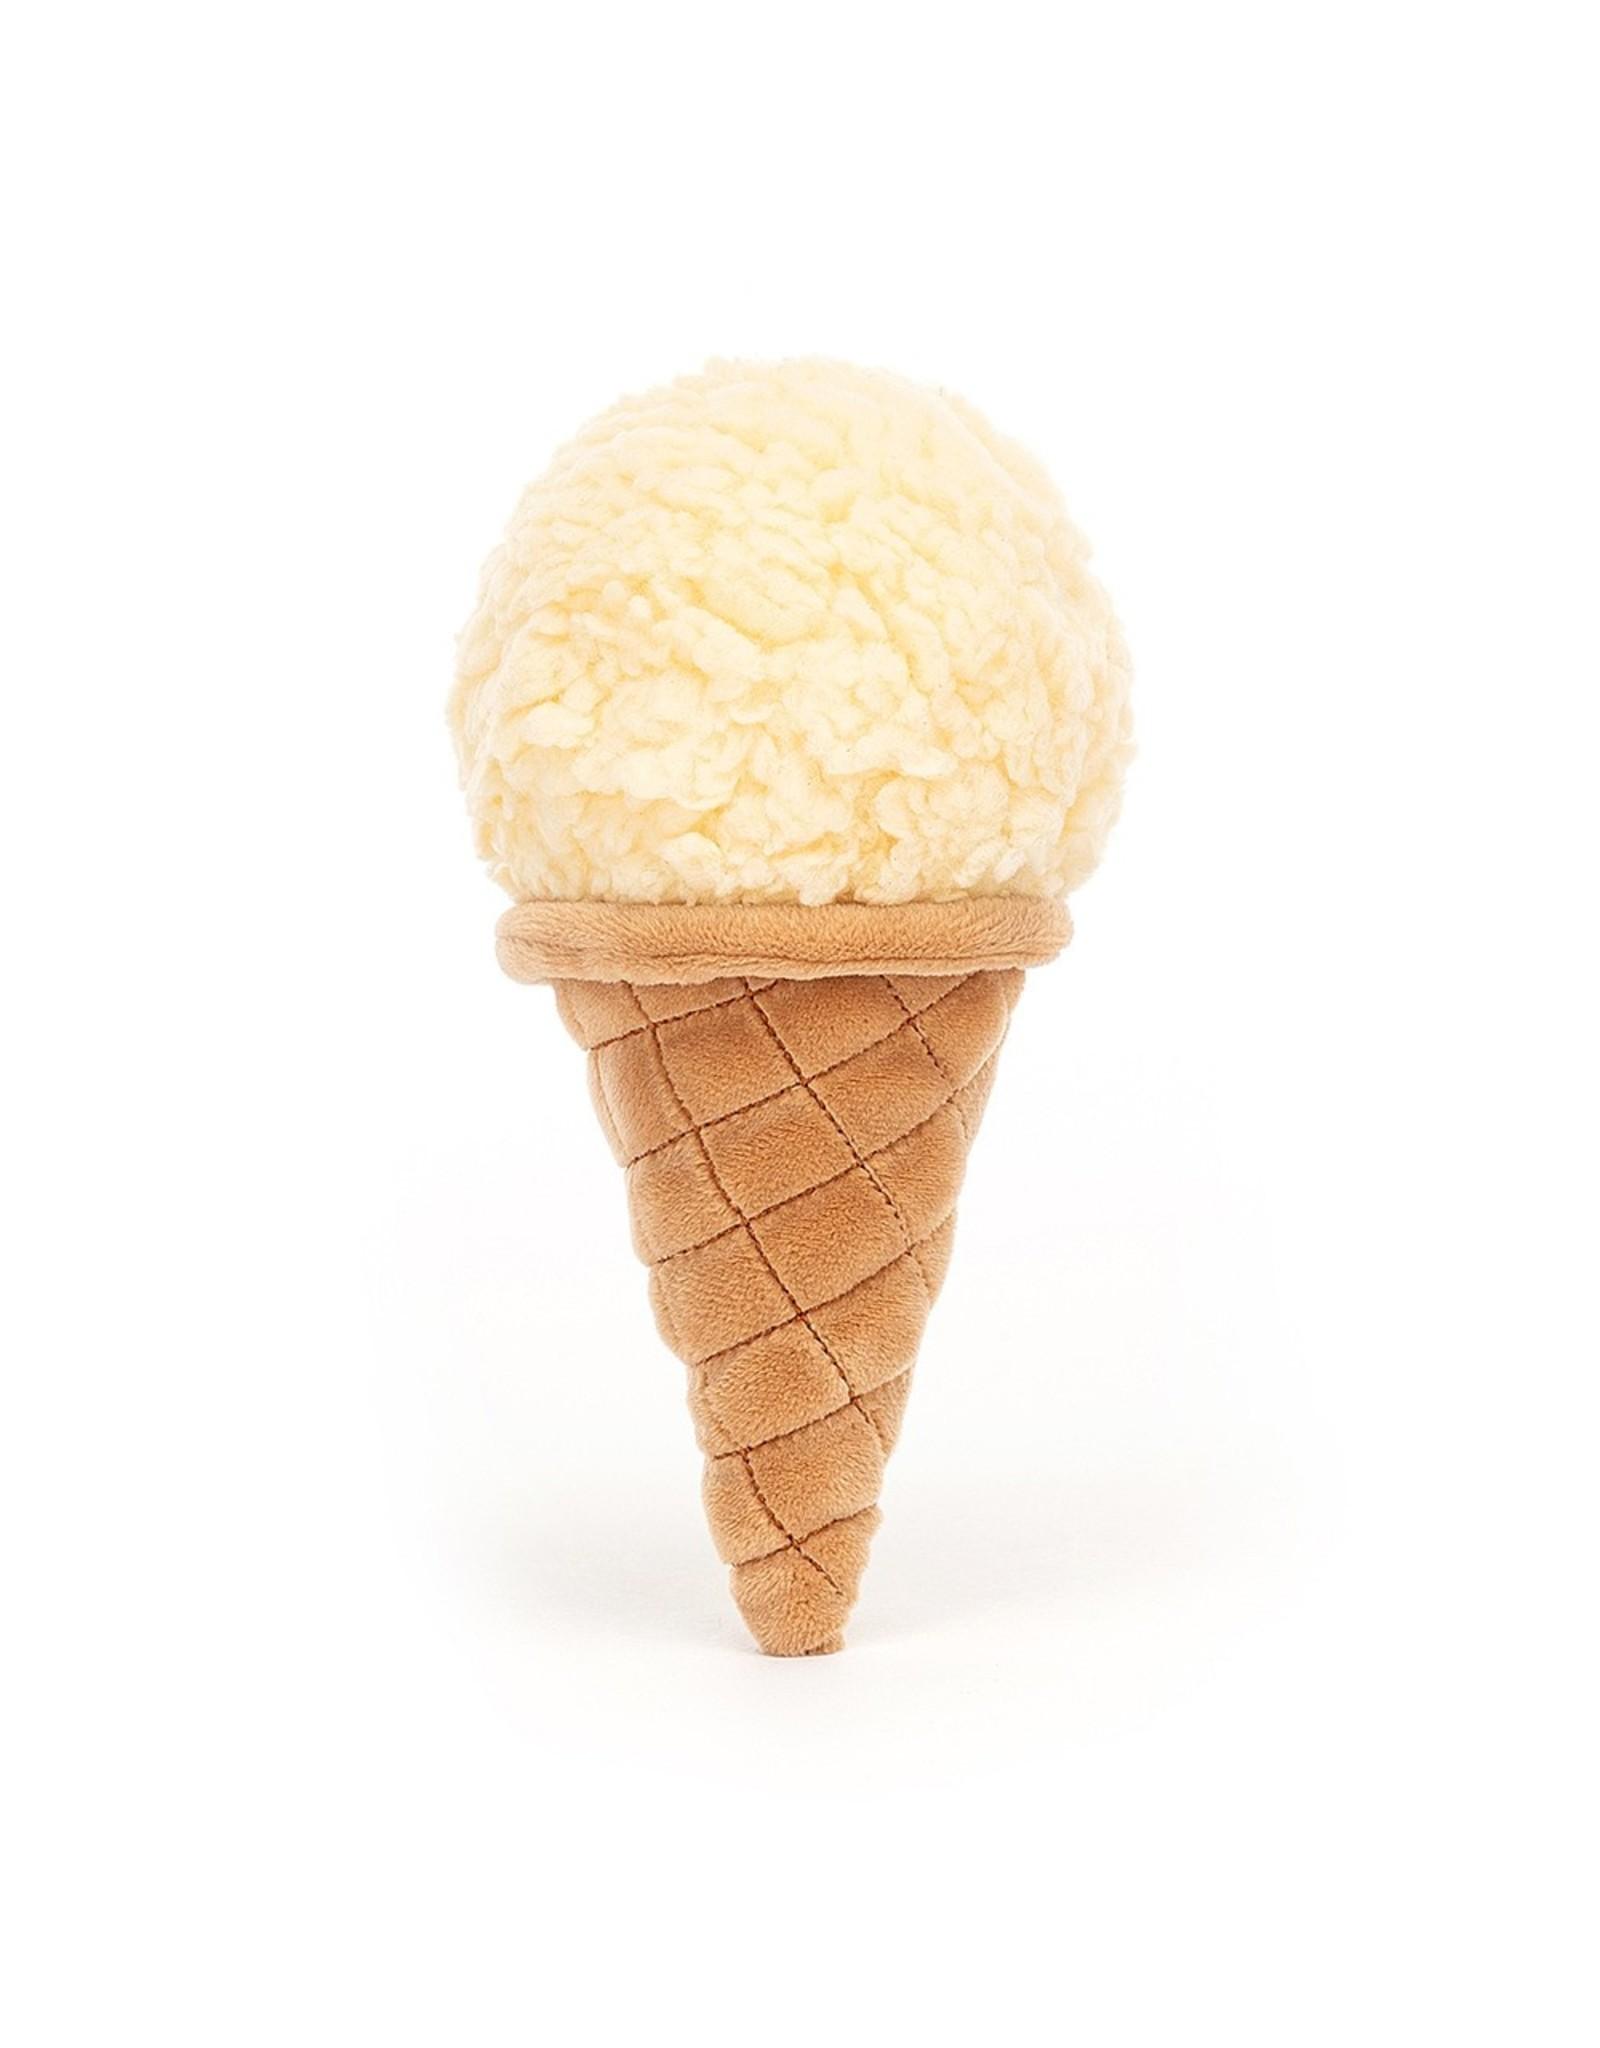 Jellycat Irrésistible glace vanille